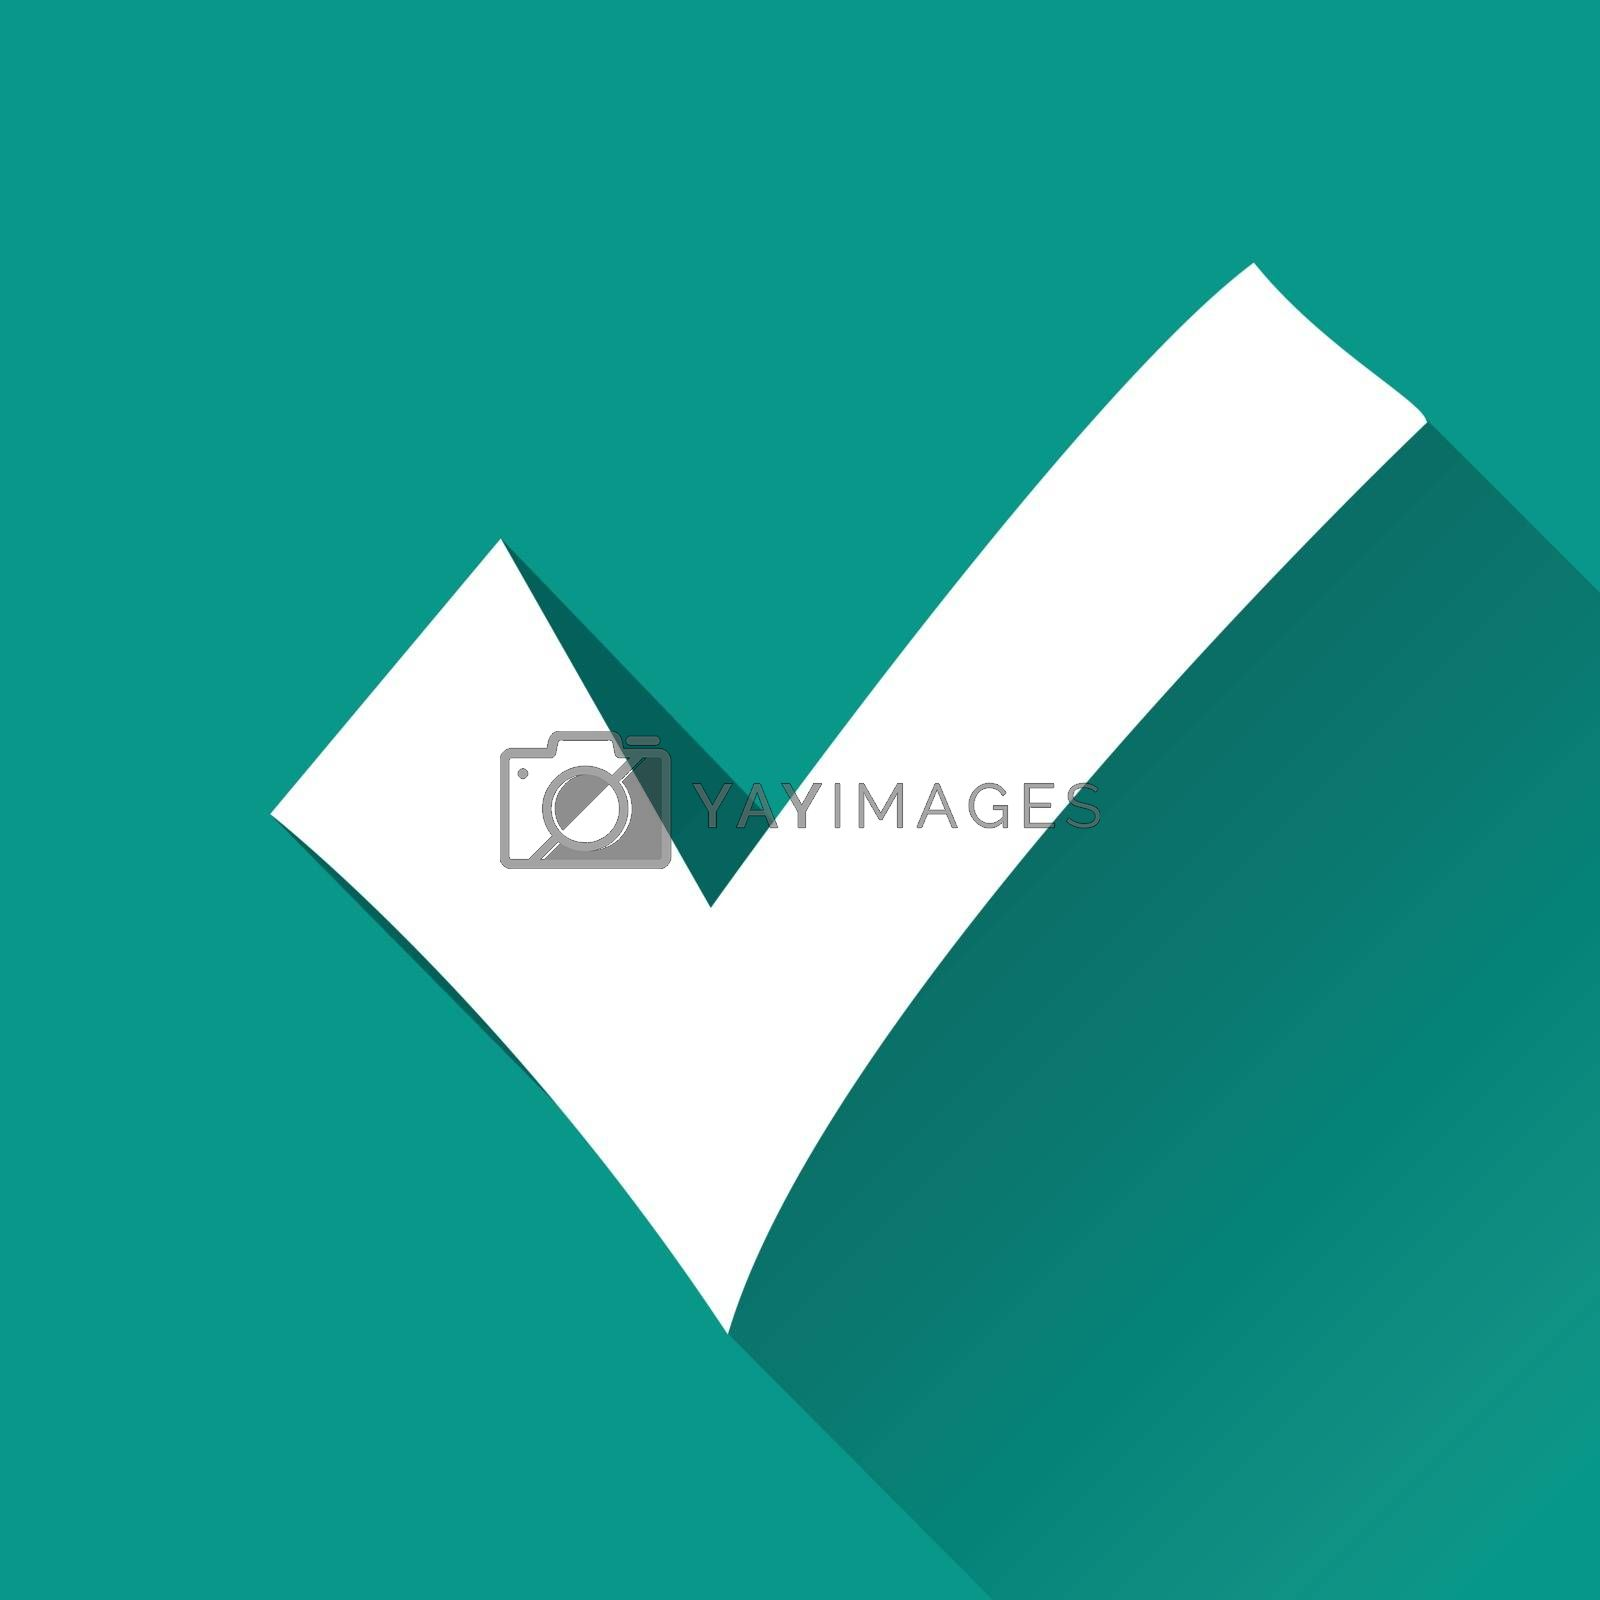 illustration of checkmark flat design icon isolated